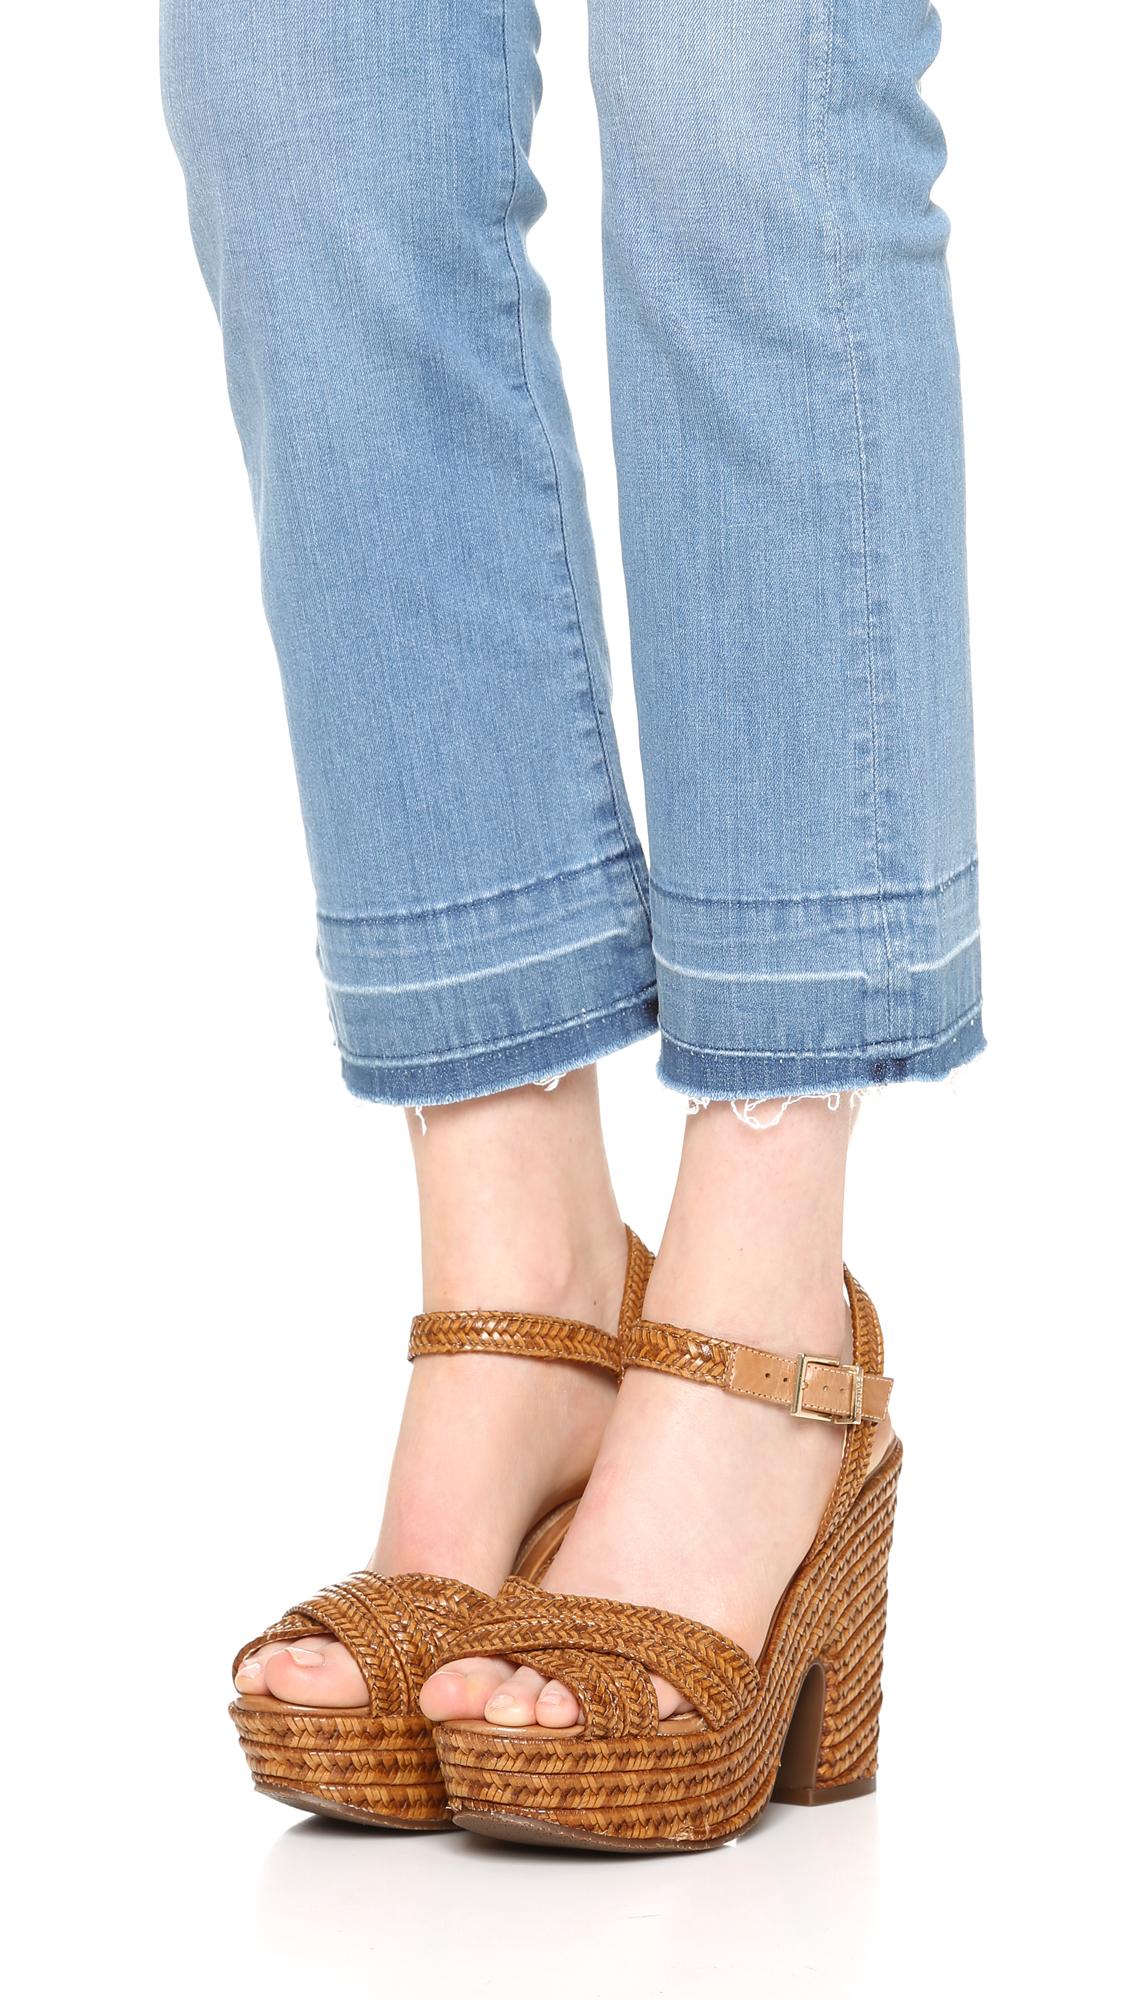 Schutz-Sz-9-Aileen-Shoe-Bamboo-Platform-Sandal-Woven-Whiskey-Designer-High-Heel_12260C.jpg